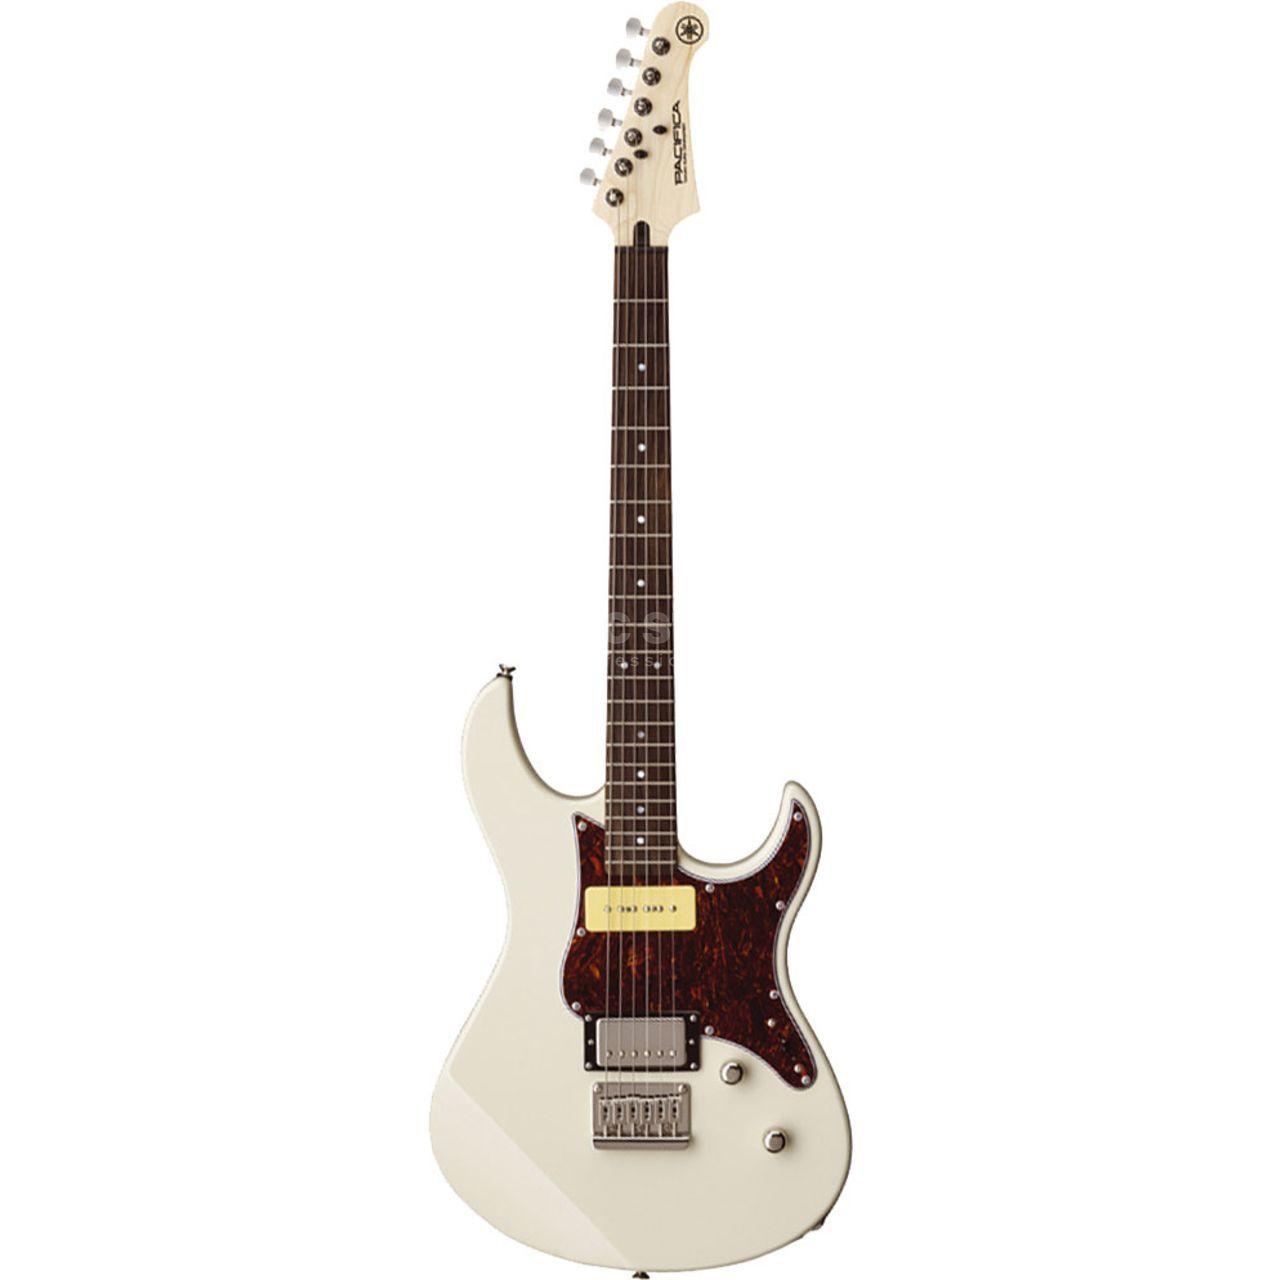 yamaha pacifica 311 electric guitar vintage white. Black Bedroom Furniture Sets. Home Design Ideas